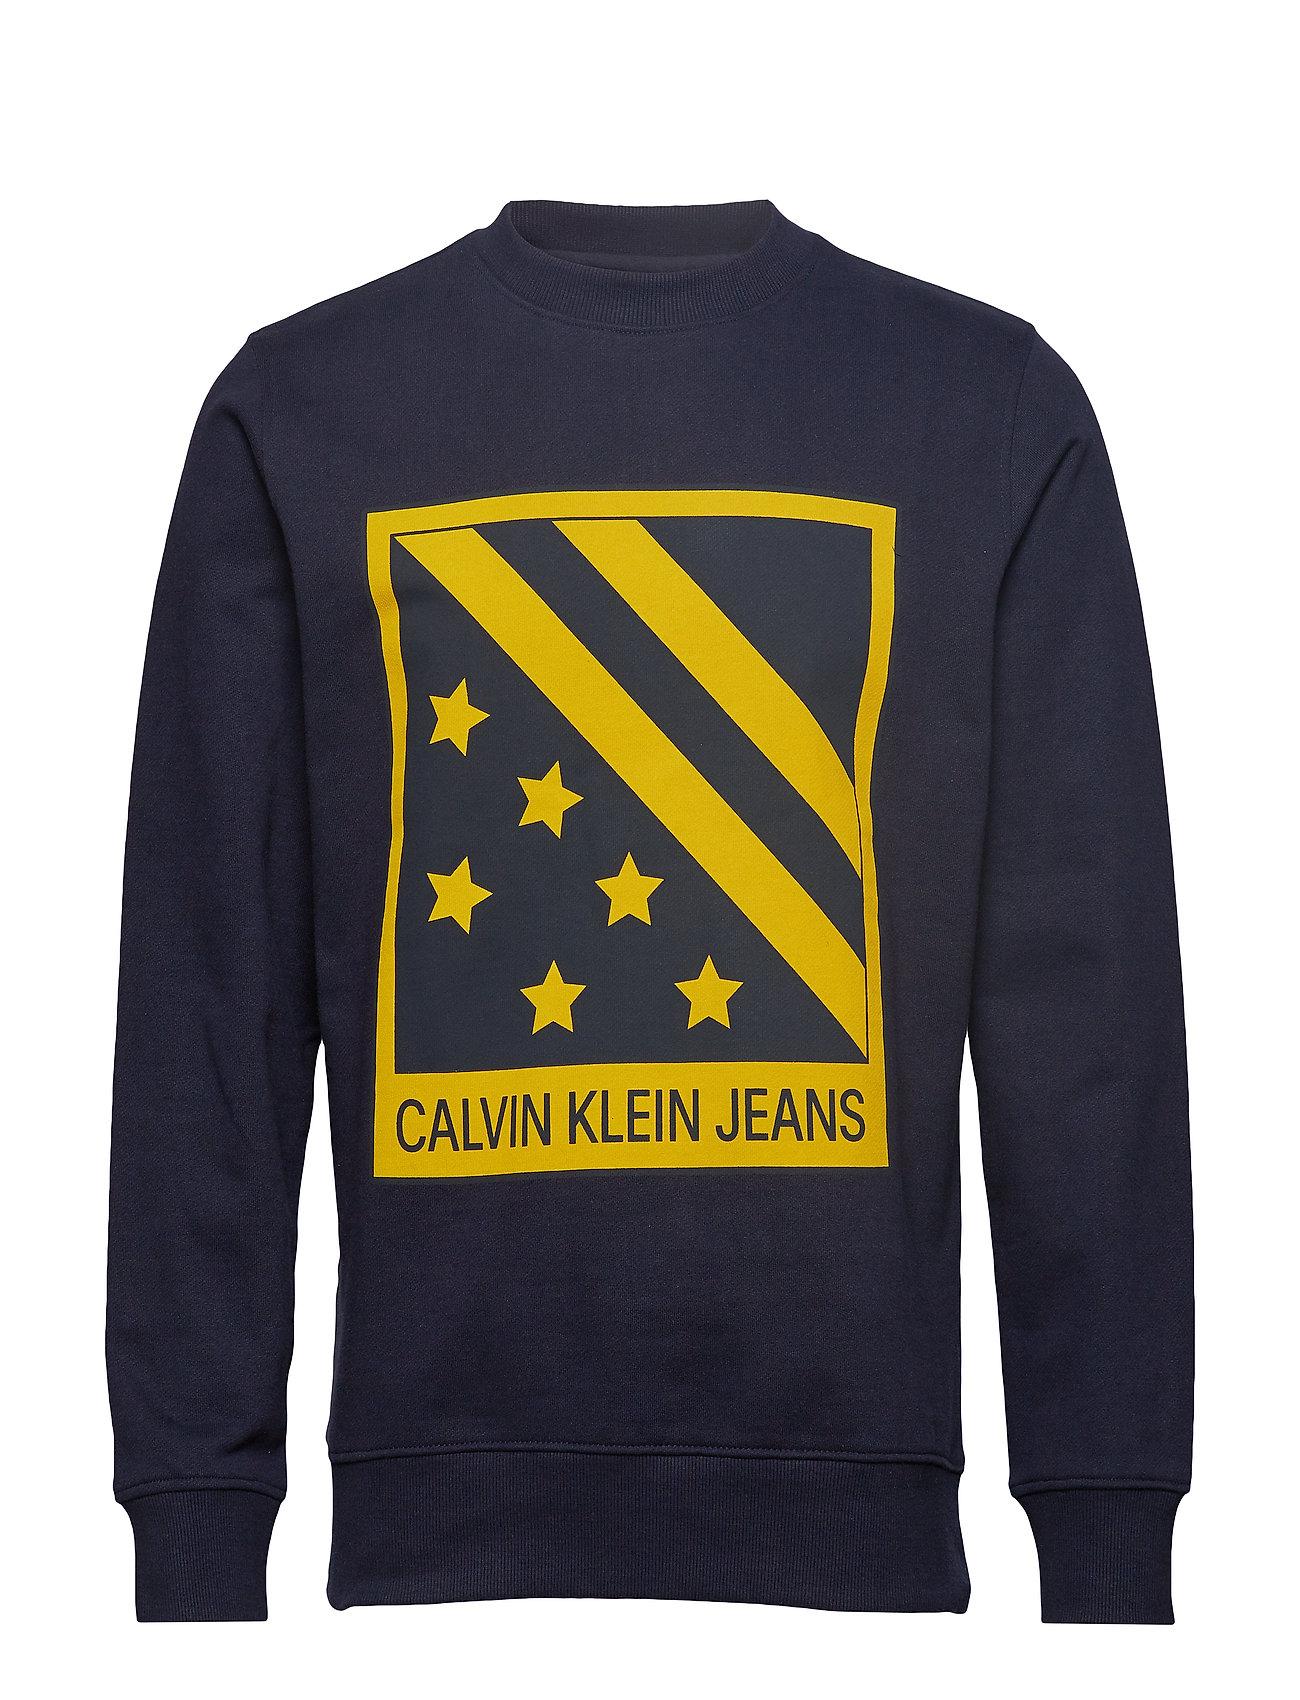 SkyCalvin Big Jeans Chest Crewnight Badge Klein jpqVSUGLzM